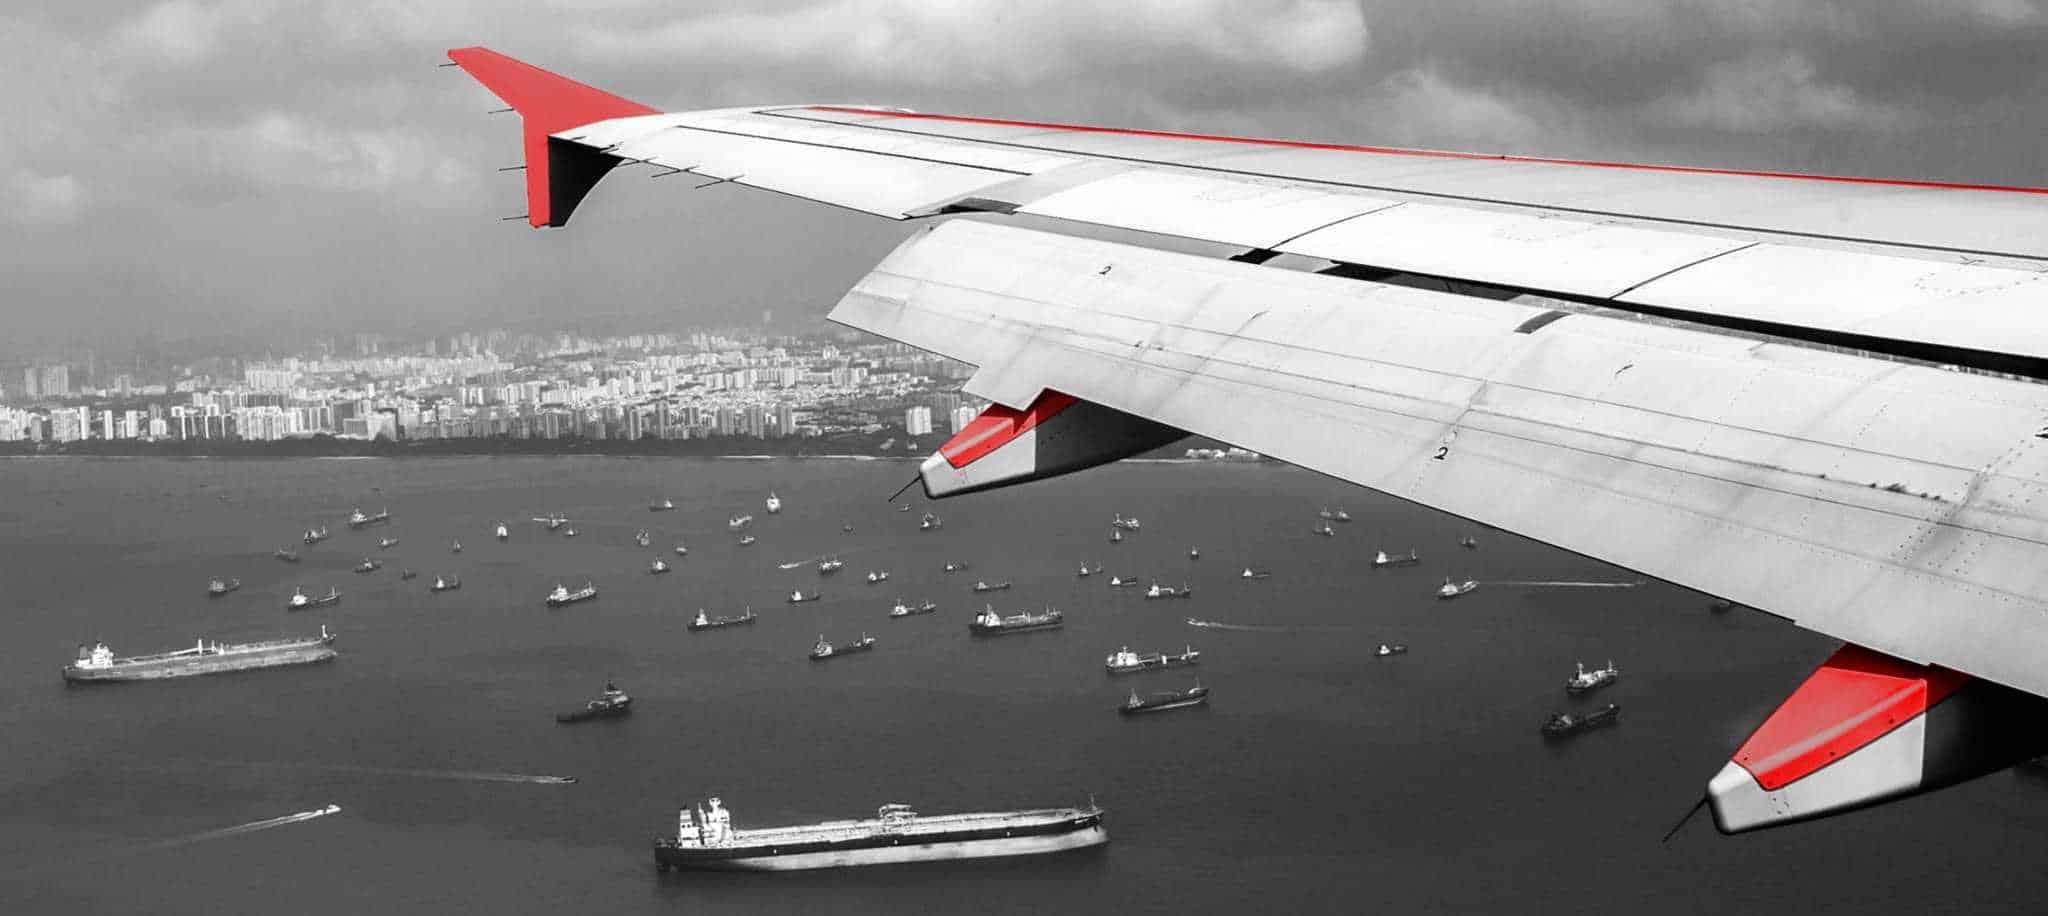 Air freight low flight